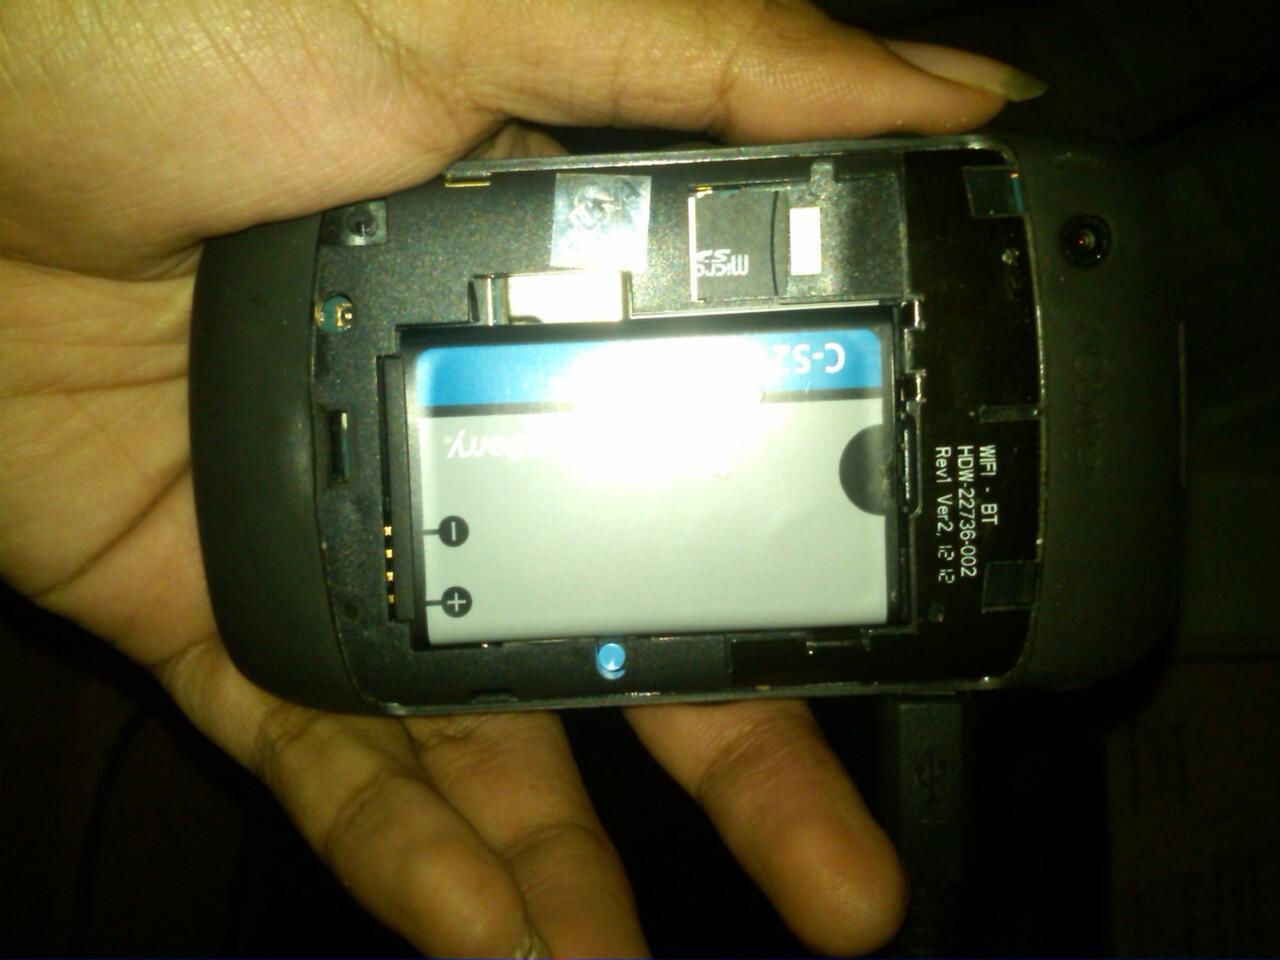 blackberry gemini garansi TAM 99,5% jos